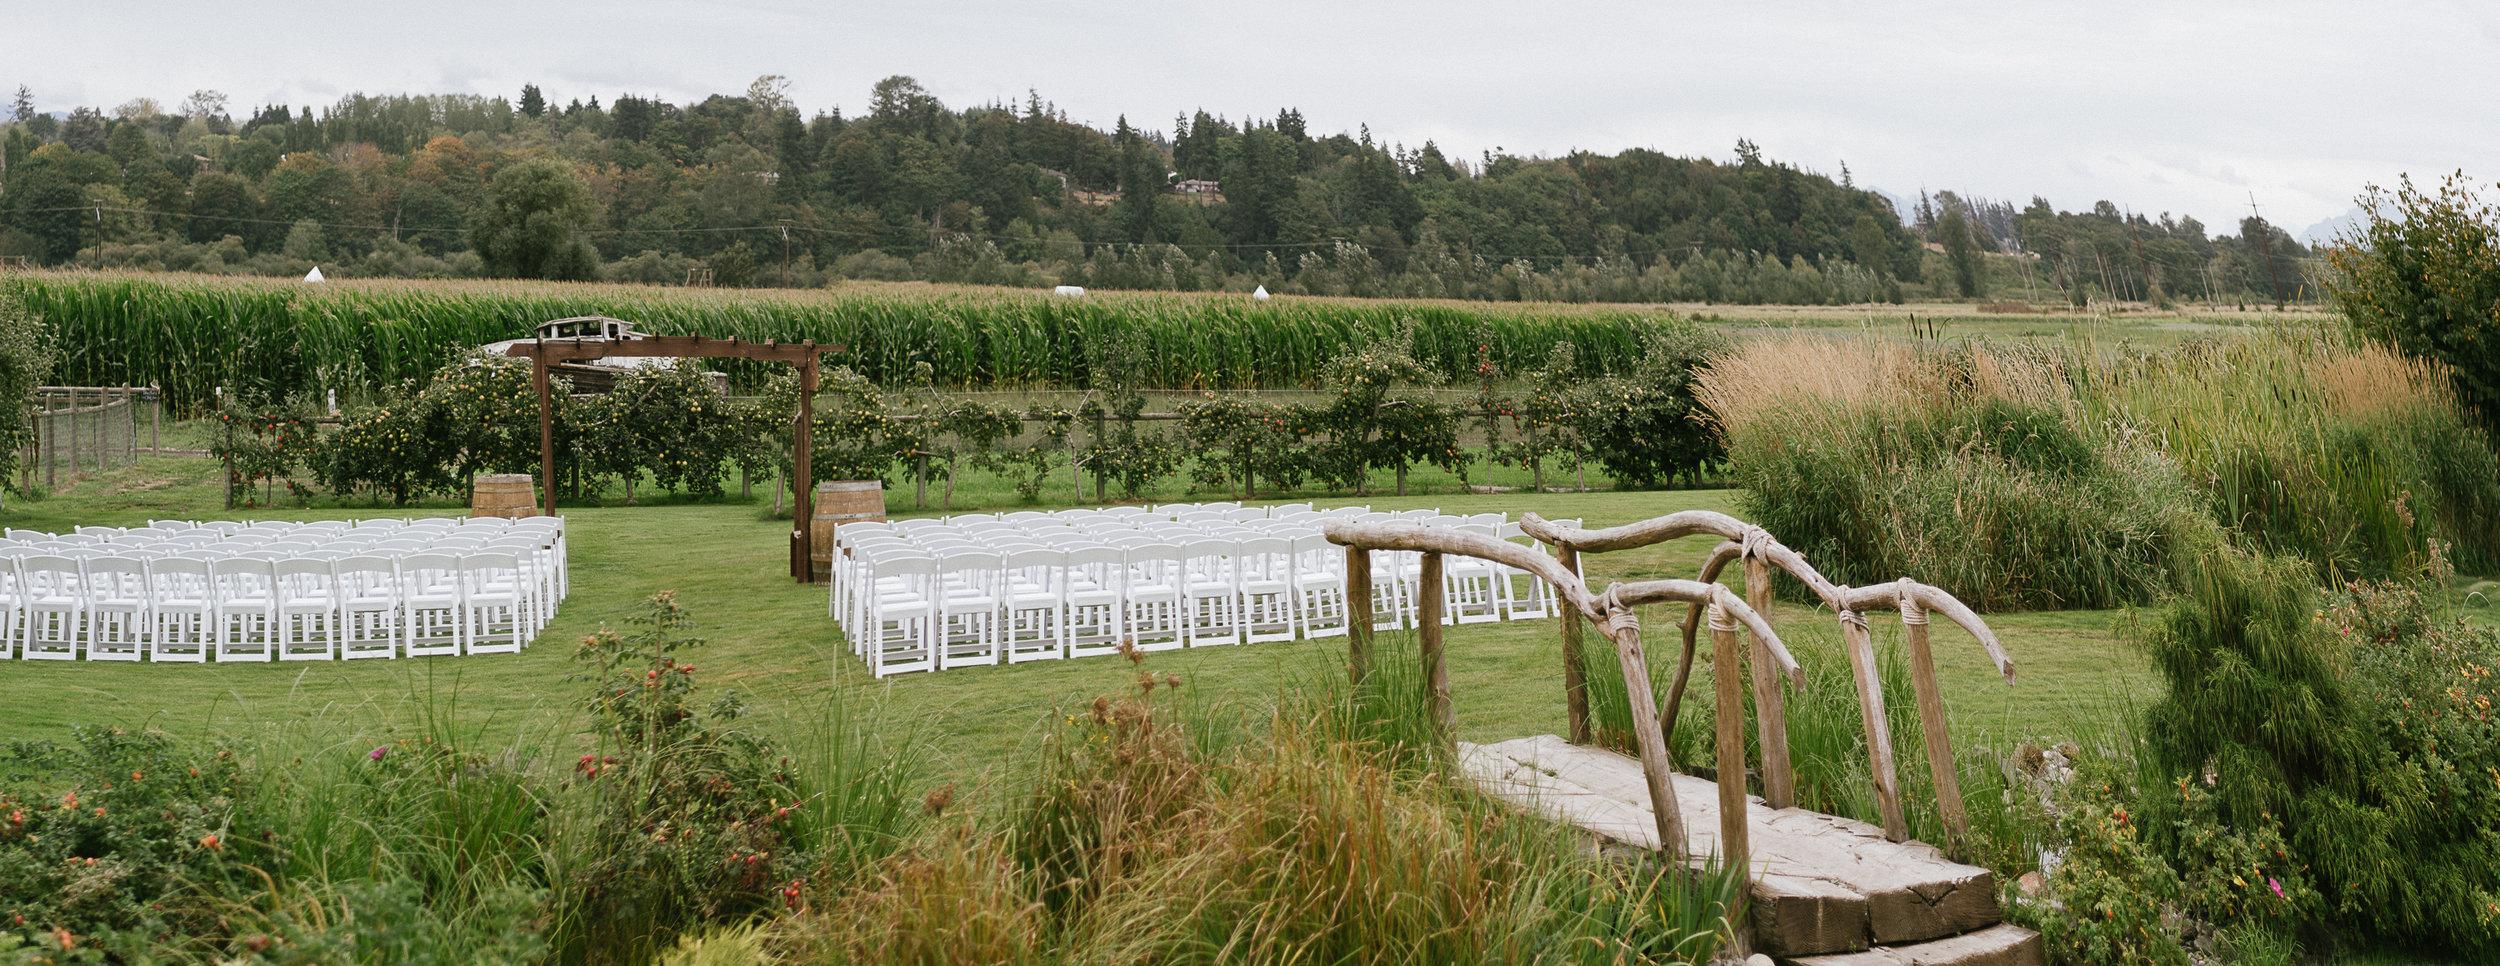 Swan Trail Farm Wedding_Sarah Schurman + Brian Skadan_Snohomish Wedding_Kelsey Lane Photography-6150-2-Pano.jpg